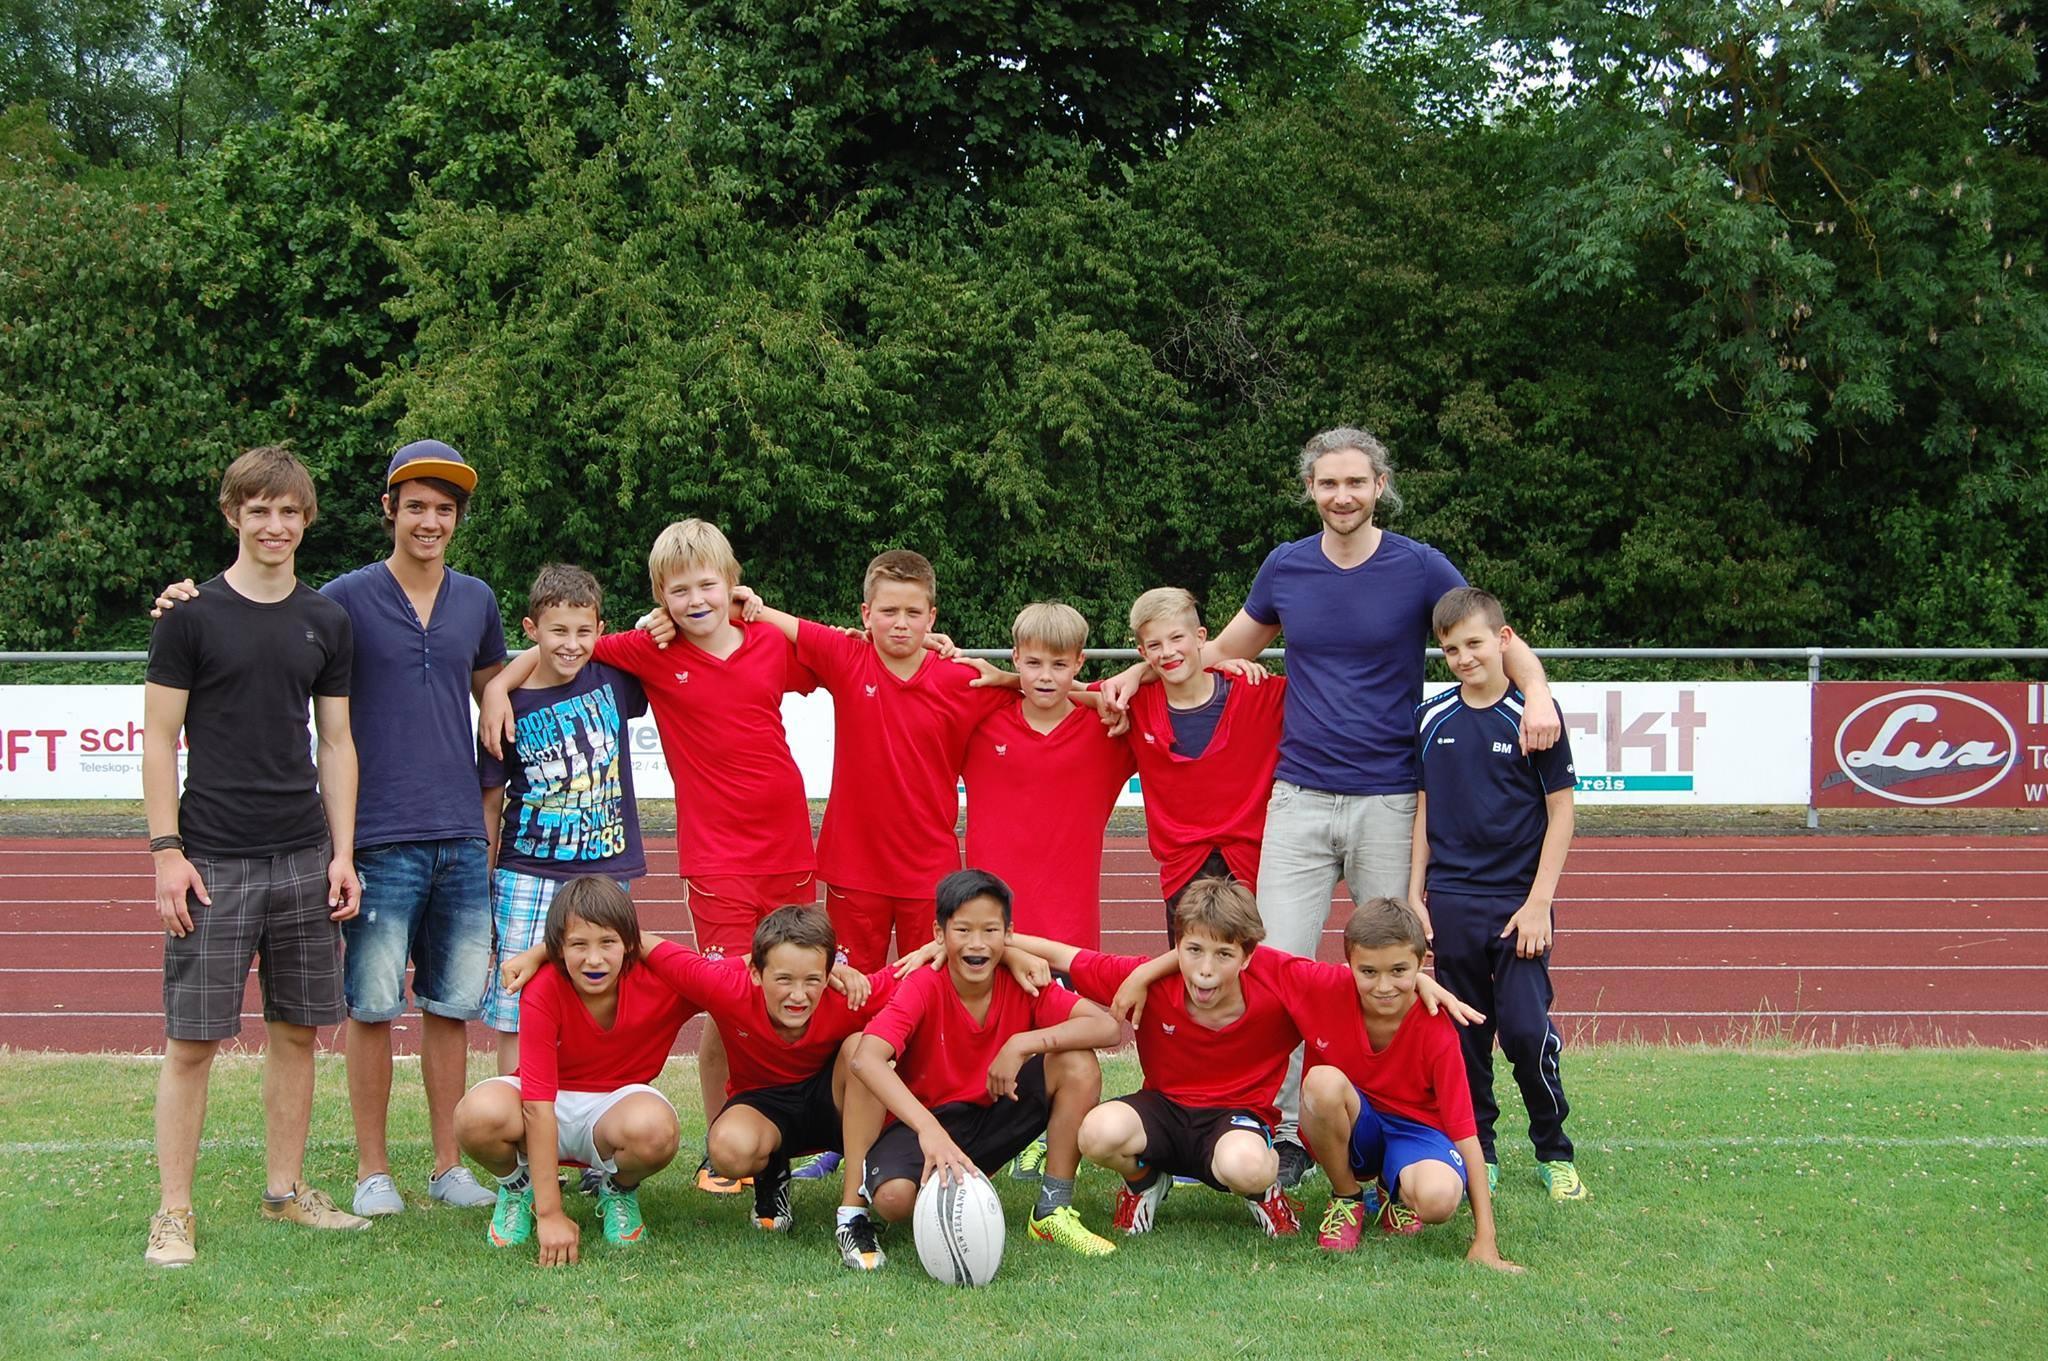 Active schools in Germany